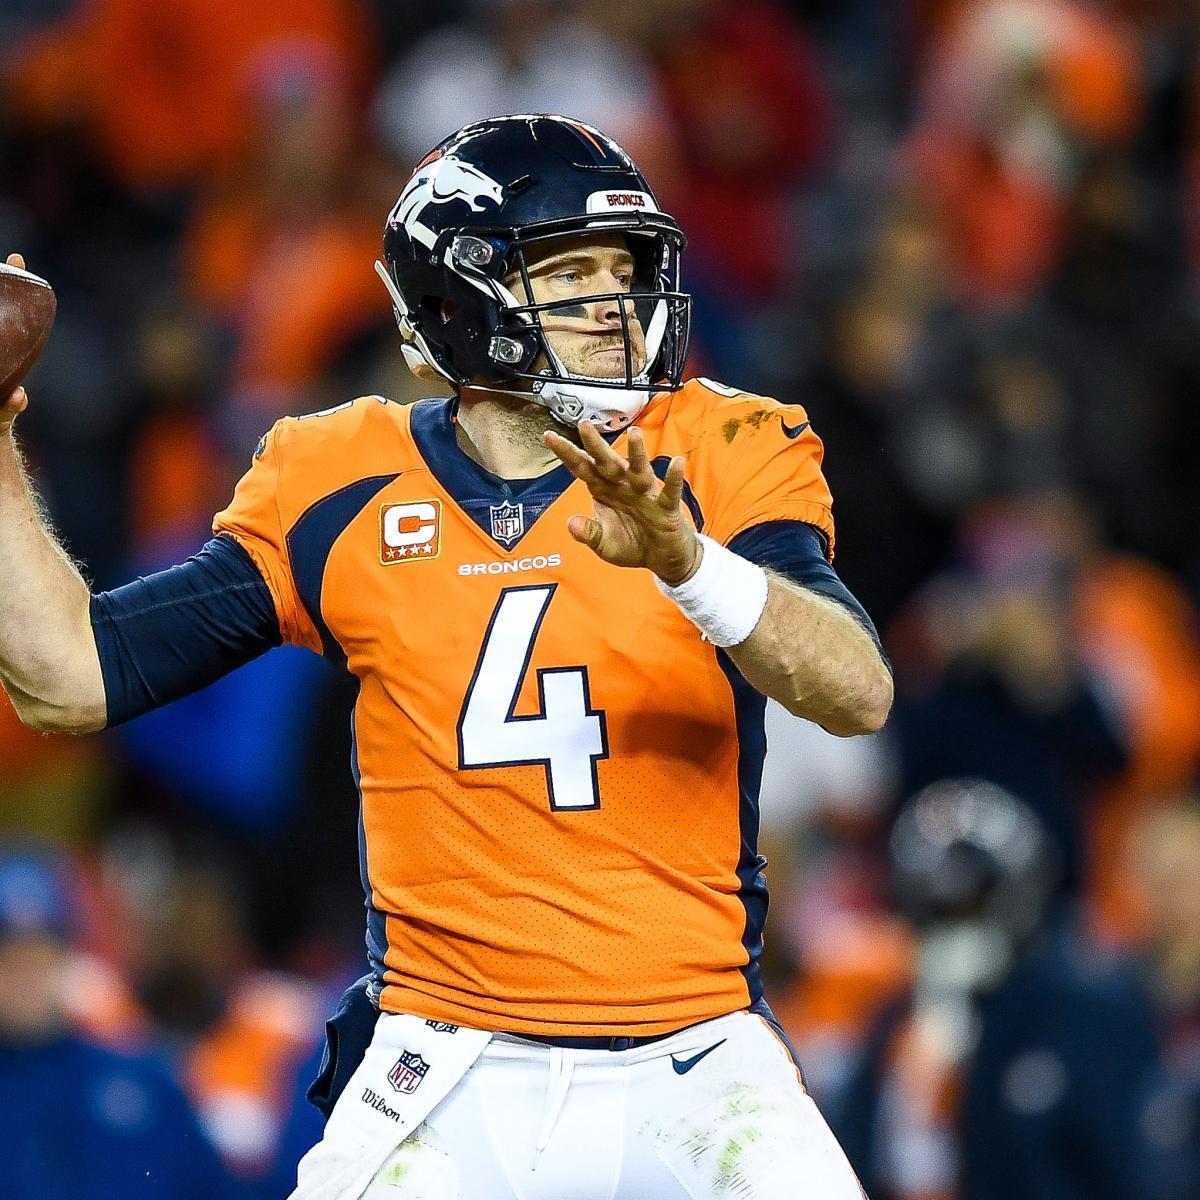 NFL Trade Rumors: Case Keenum Traded To Redskins; Broncos